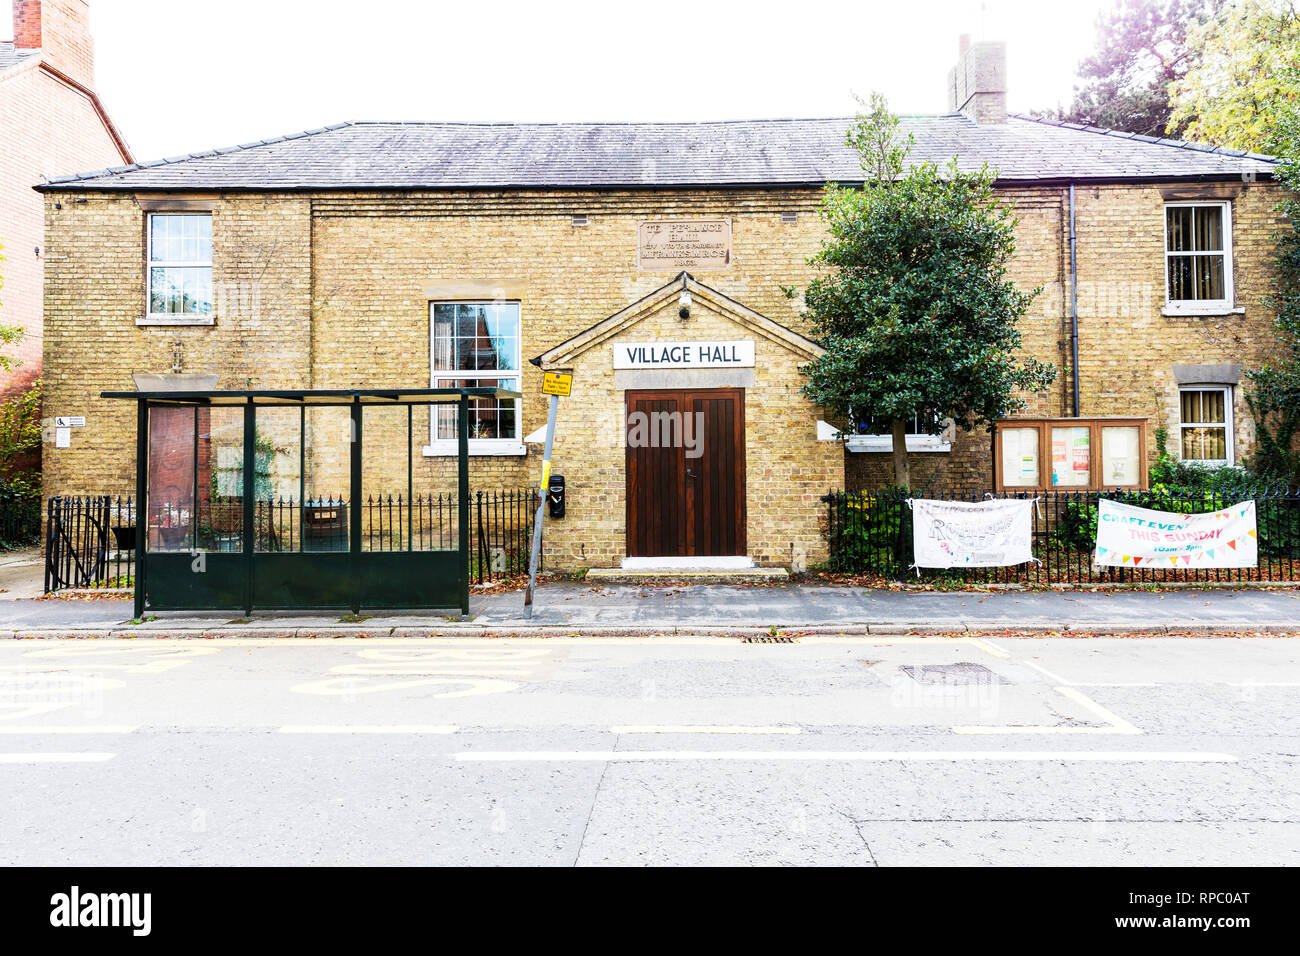 Heckington Village Hall, Heckington Temperance Hall, Village Hall, building, exterior, sign, historic, village halls, Lincolnshire UK, village hall, Stock Photo